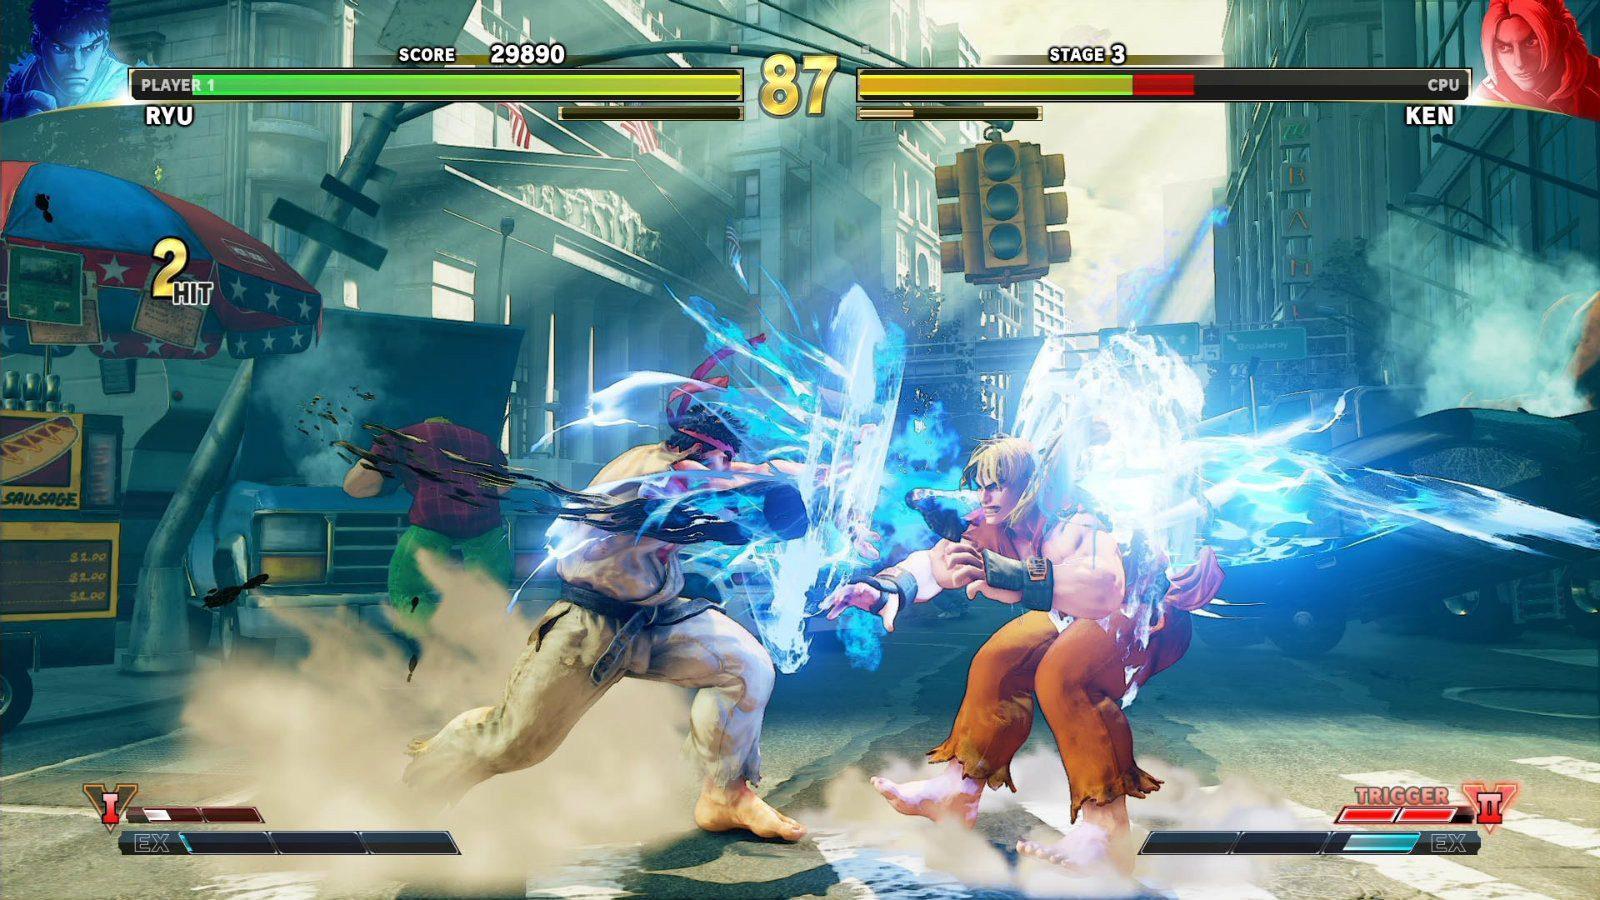 Capcom/Street Fighter